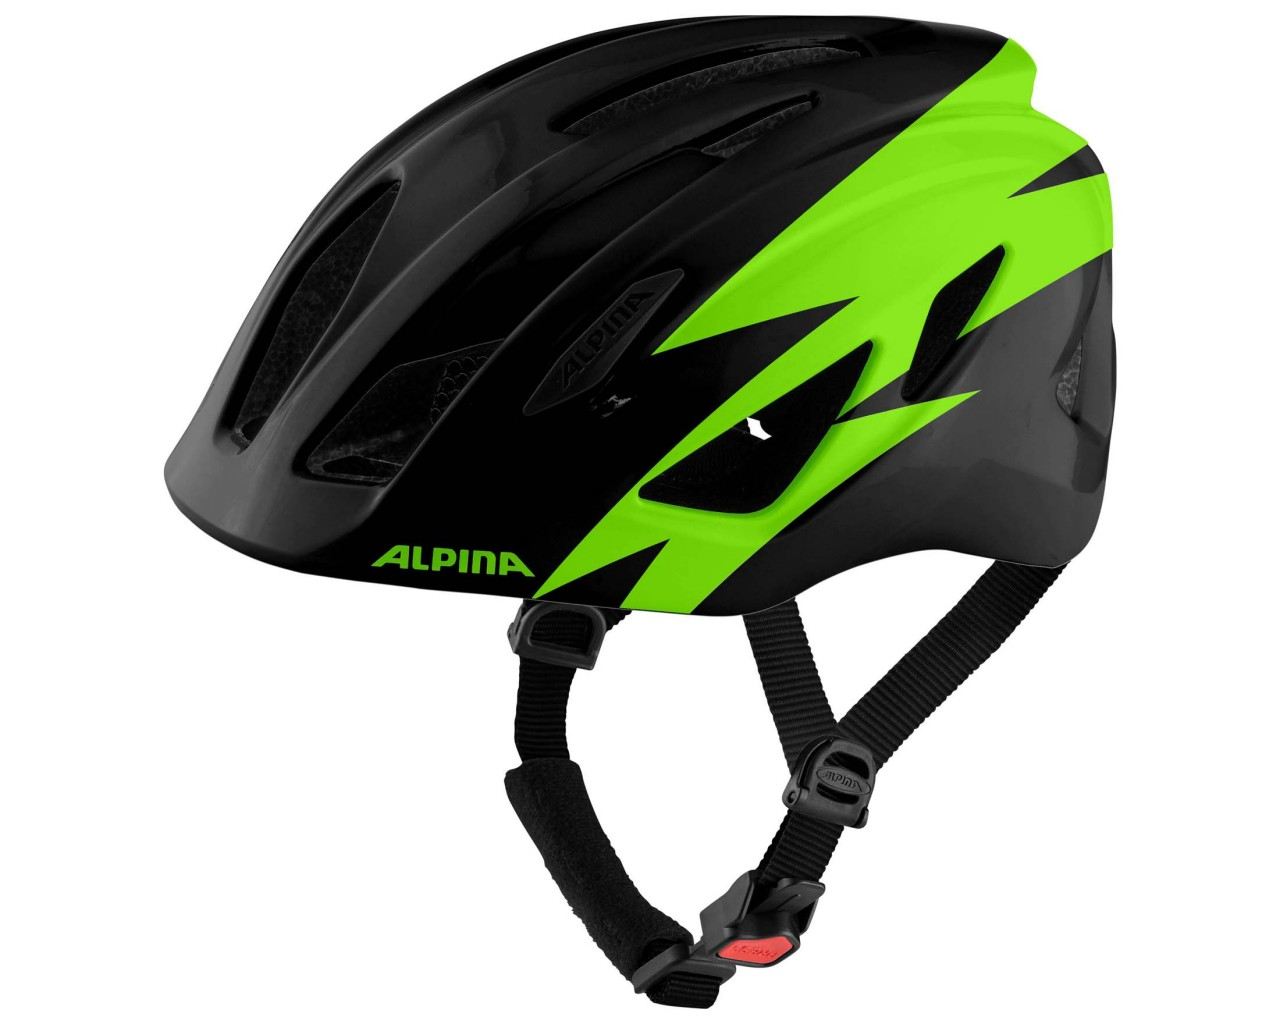 Alpina Pico Kinder Fahrradhelm | black-green gloss 50-55